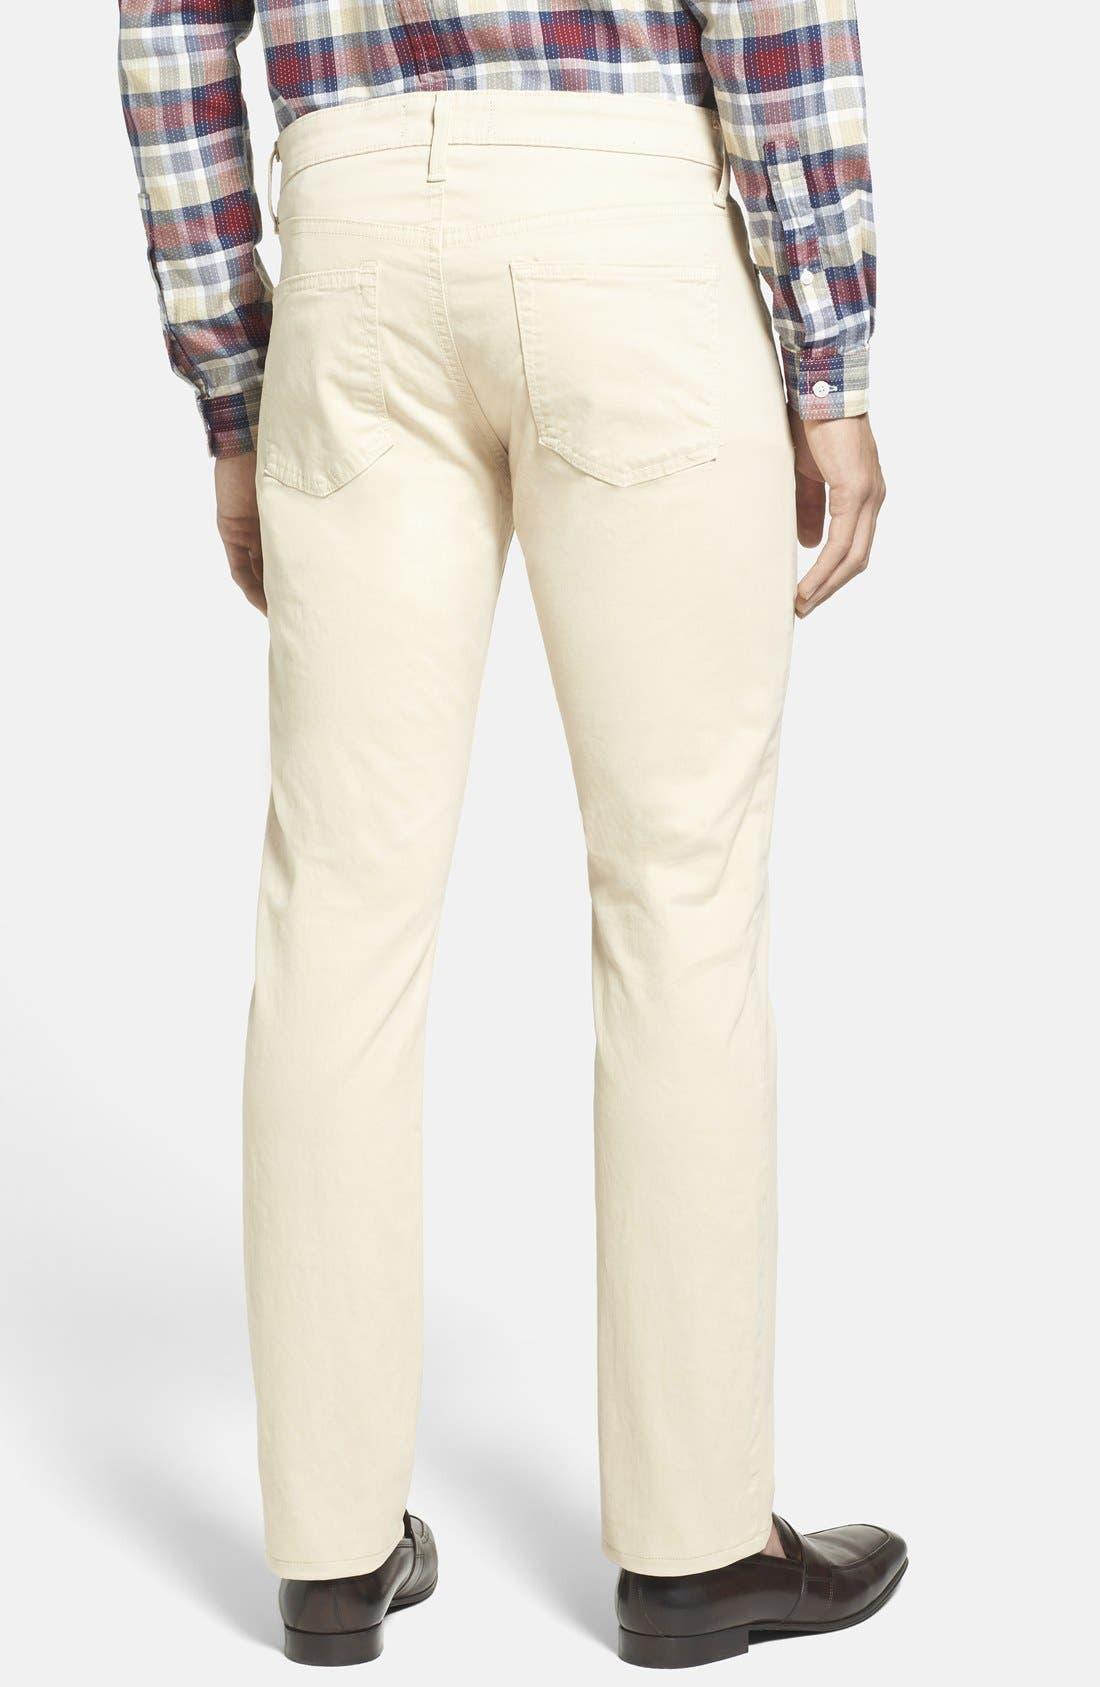 'Kane' Slim Fit Cotton Twill Pants,                             Alternate thumbnail 31, color,